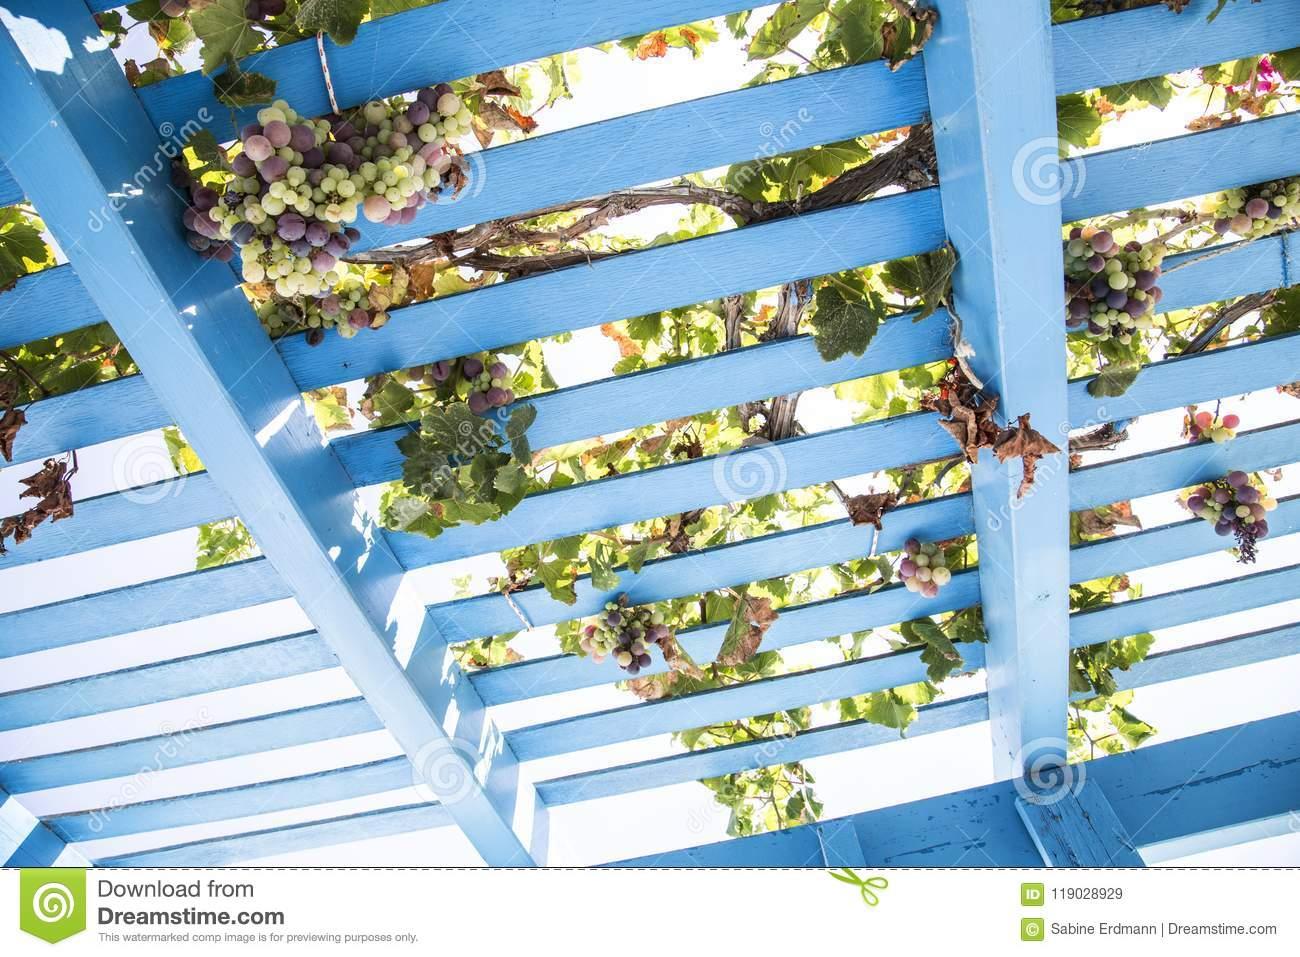 looking up blue painted wooden pergola lattice vines grapes blue painted wooden pergola lattice vines grapes